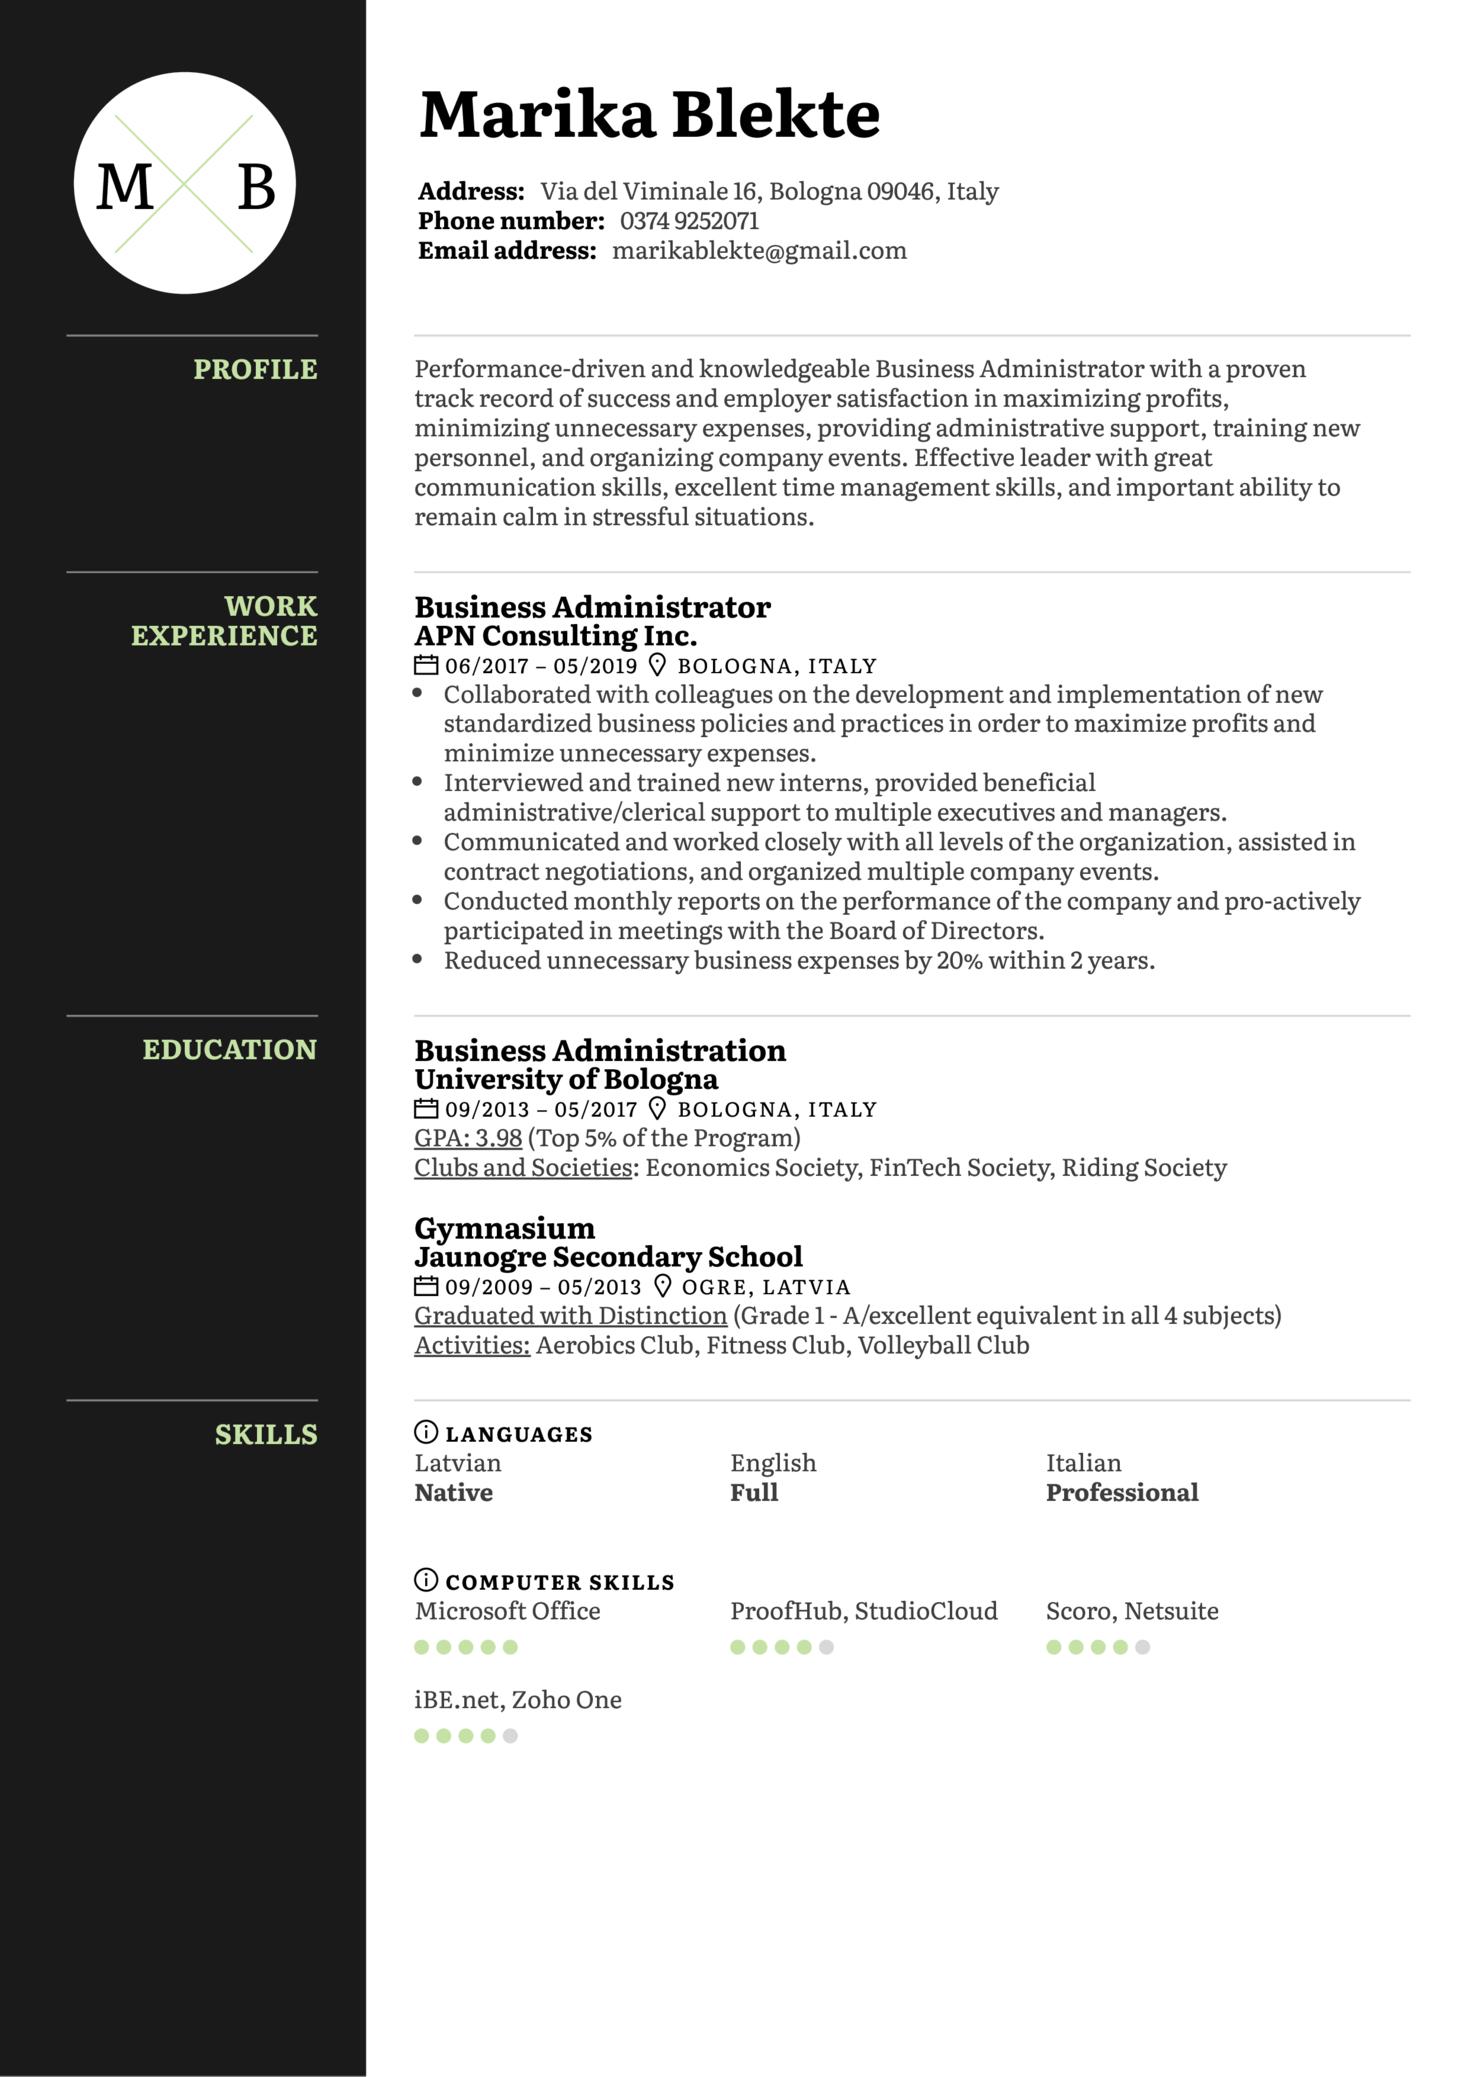 Business Administrator Resume Sample (Part 1)